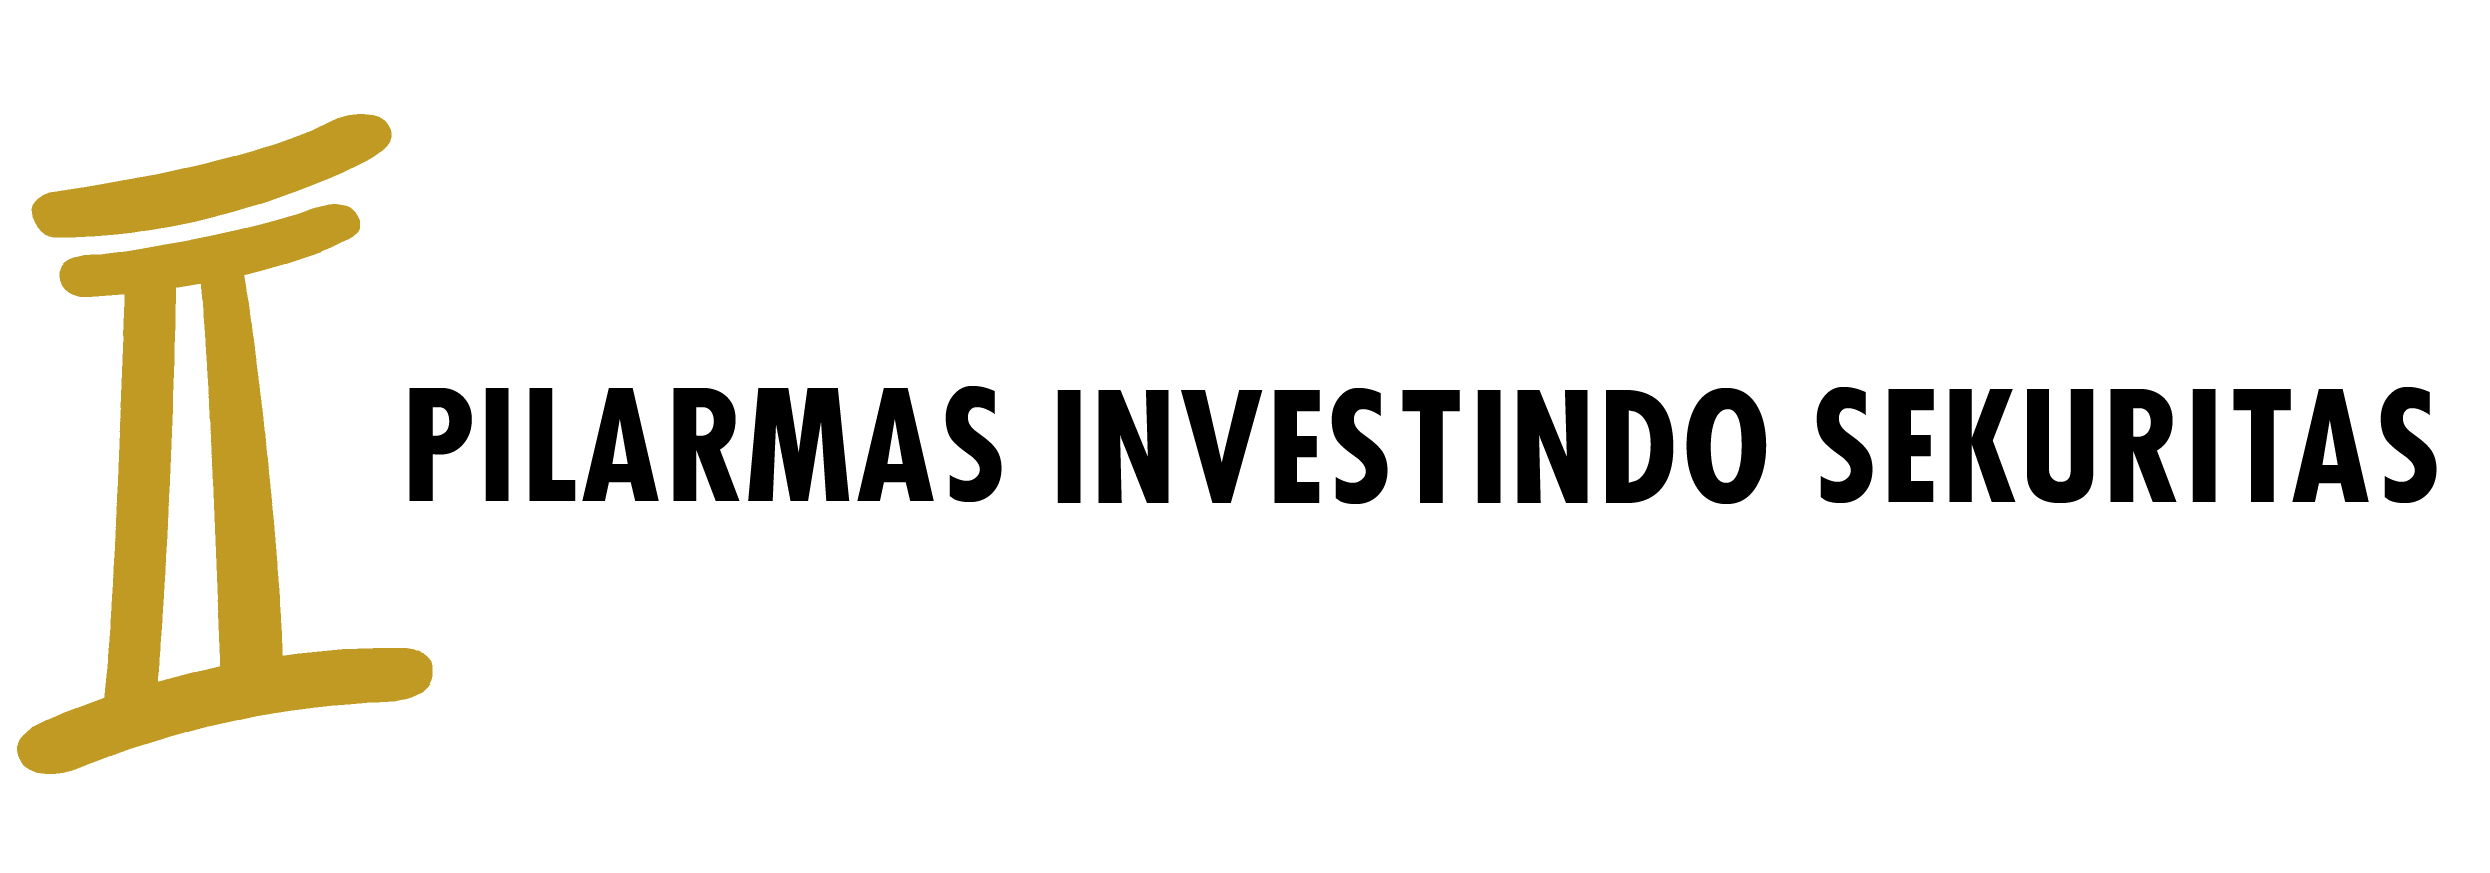 logo-pilarmas-baru.1548126050146